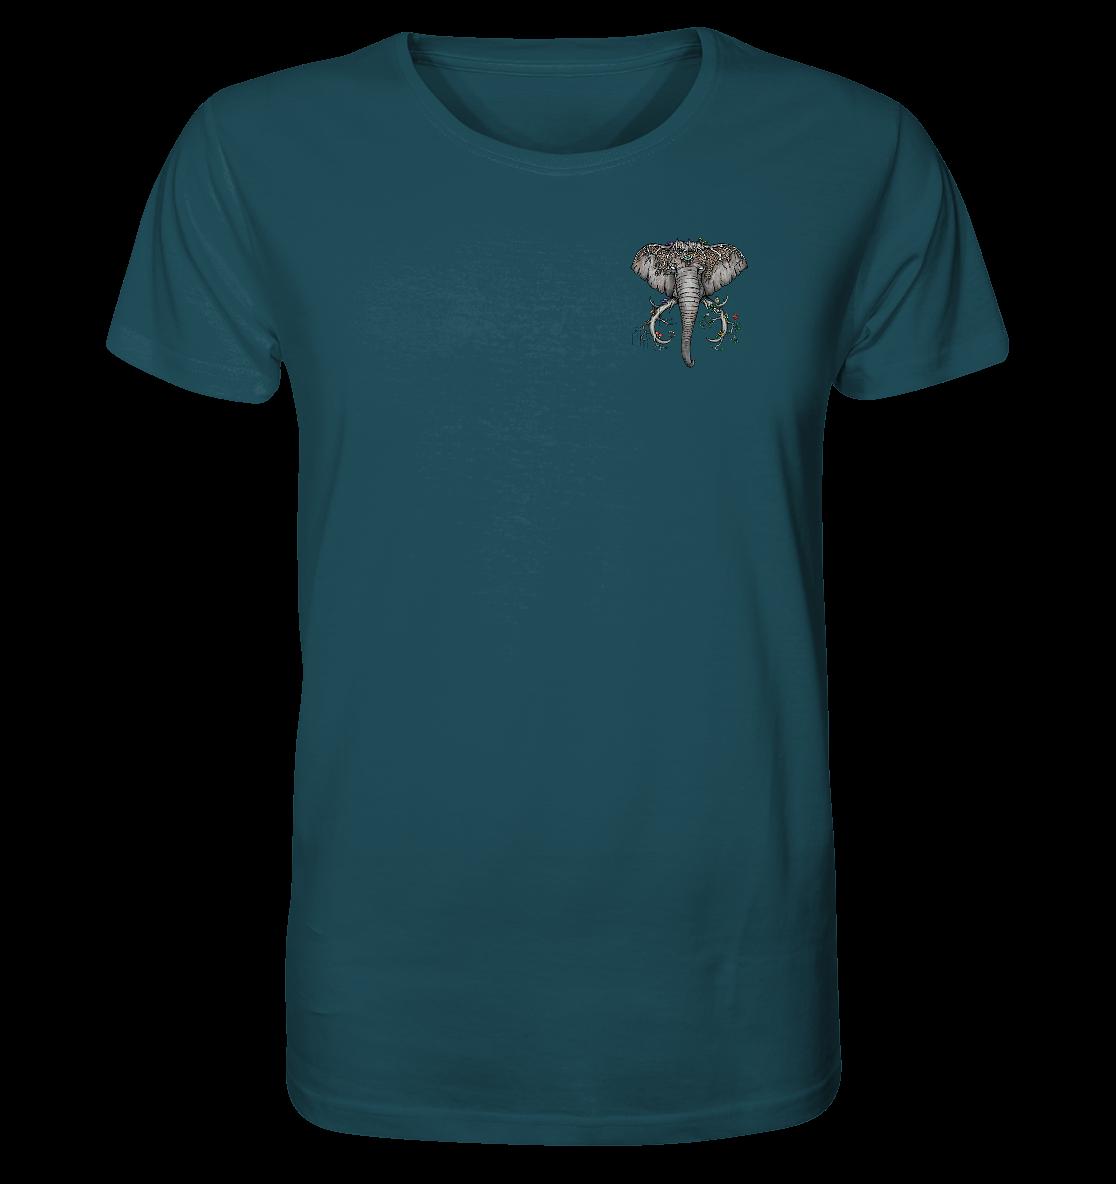 front-organic-shirt-204d59-1116x-2.png